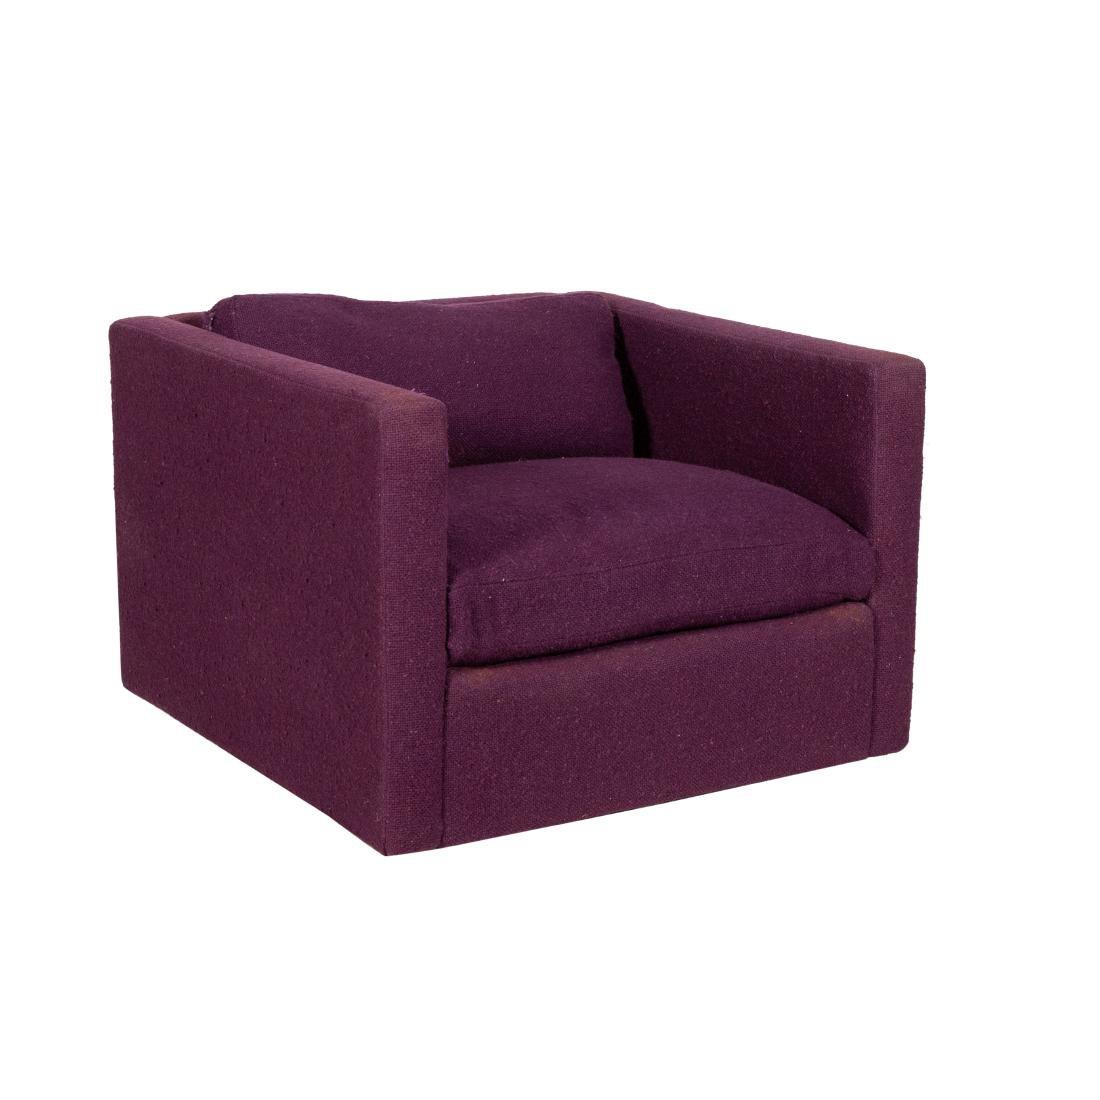 Charles Pfister - Knoll - Lounge Chair